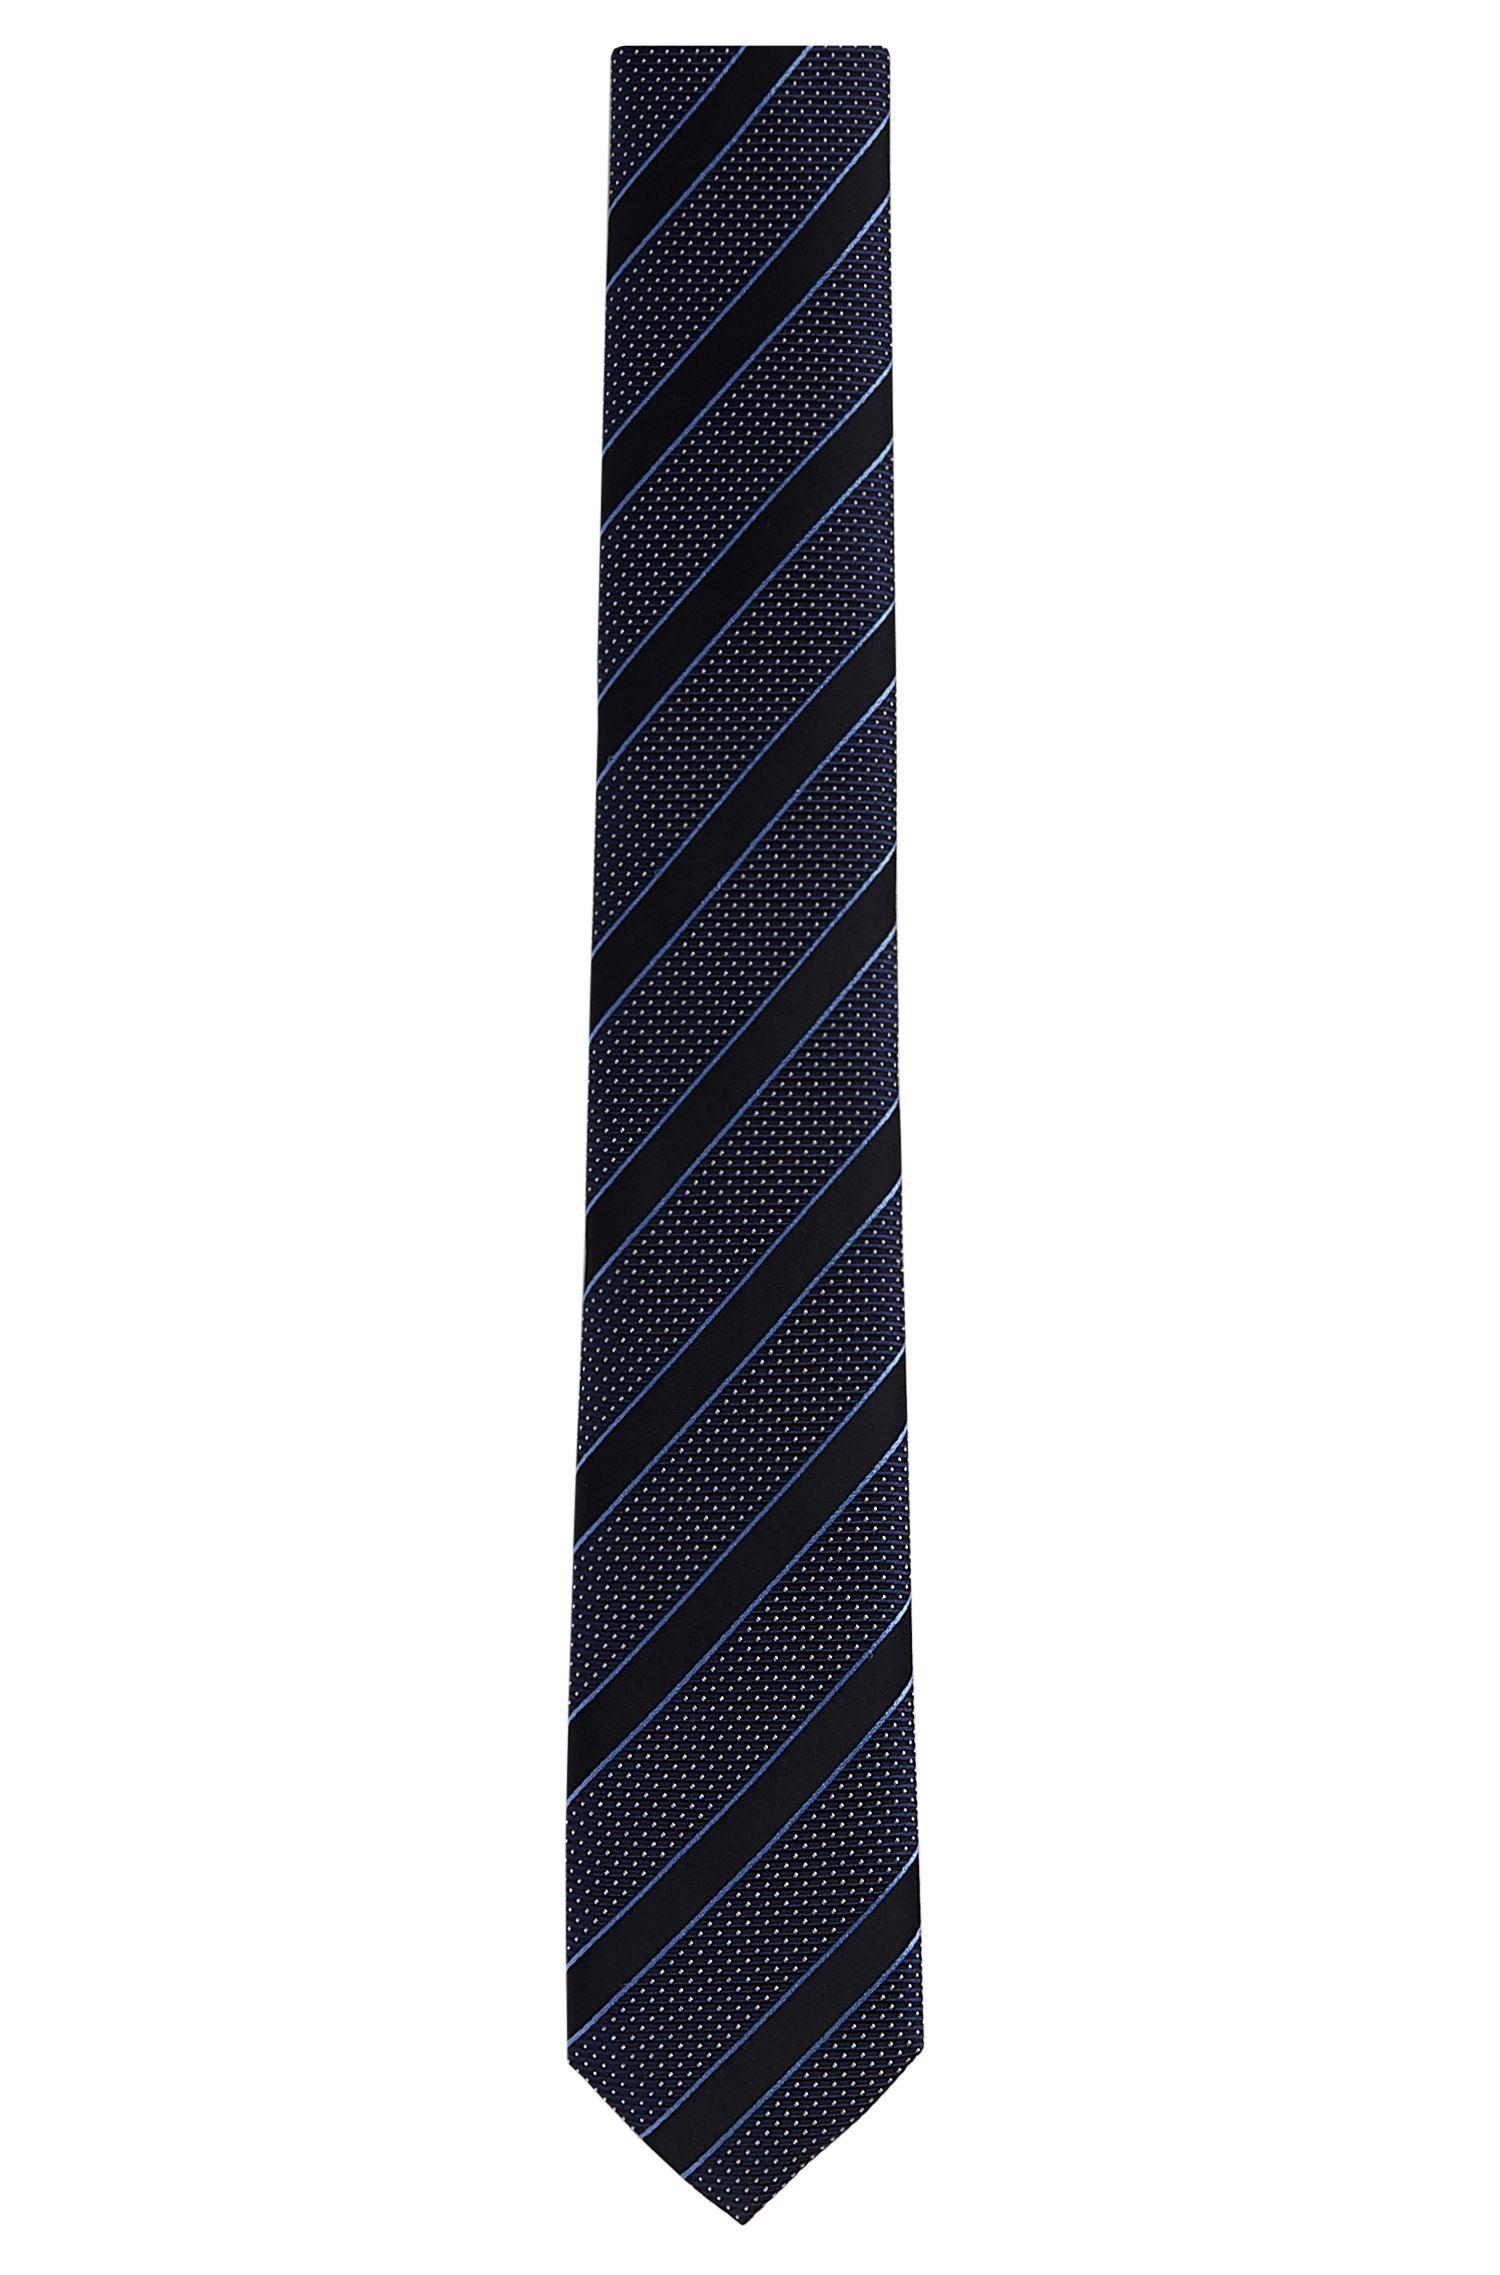 Patterned Italian Silk Slim Tie, Dark Blue